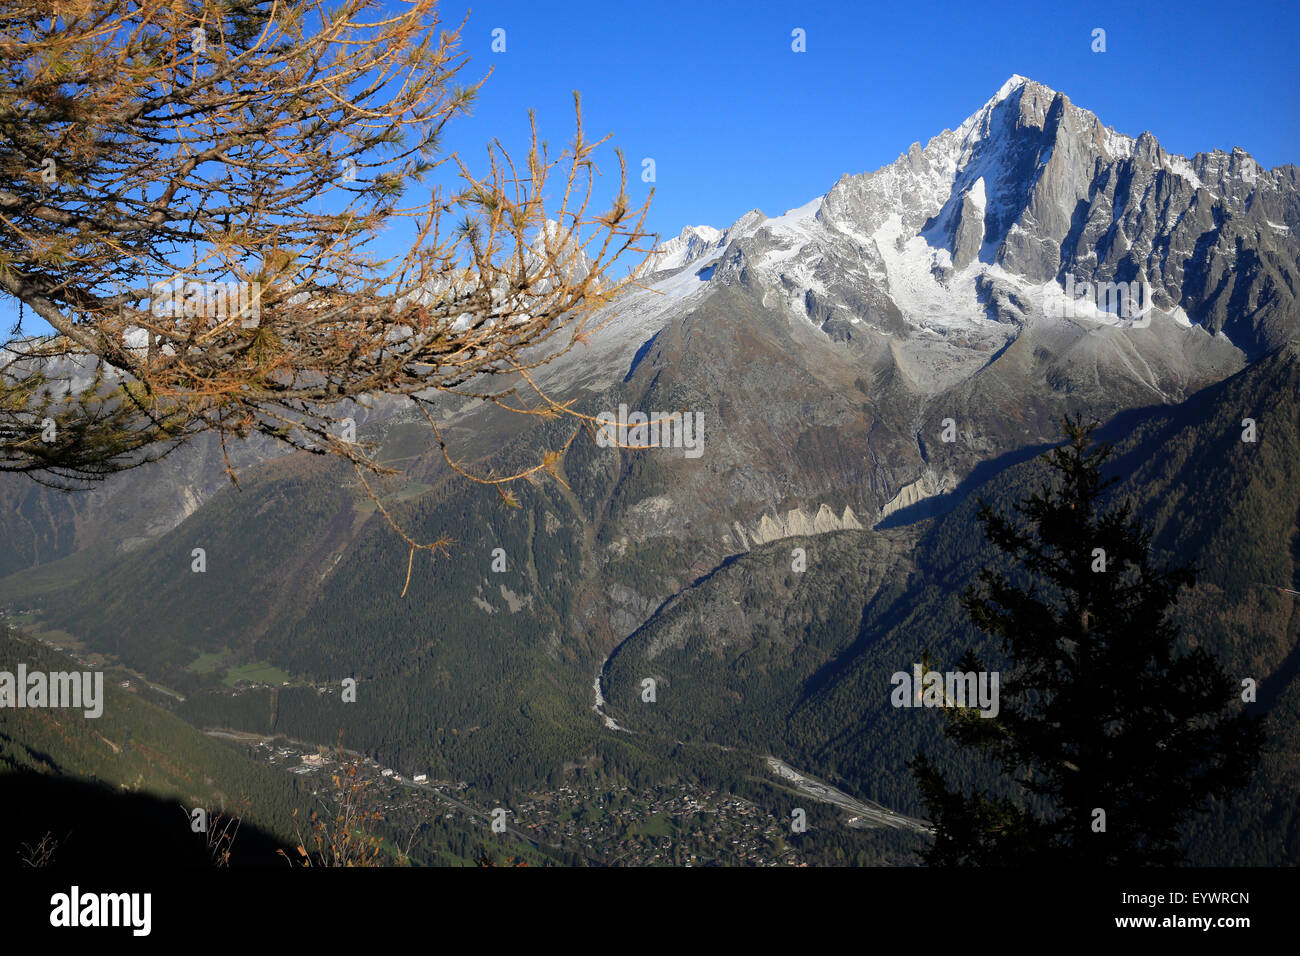 Chamonix, Massif du Mont Blanc, Alpes, Haute-Savoie, France, Europe Photo Stock